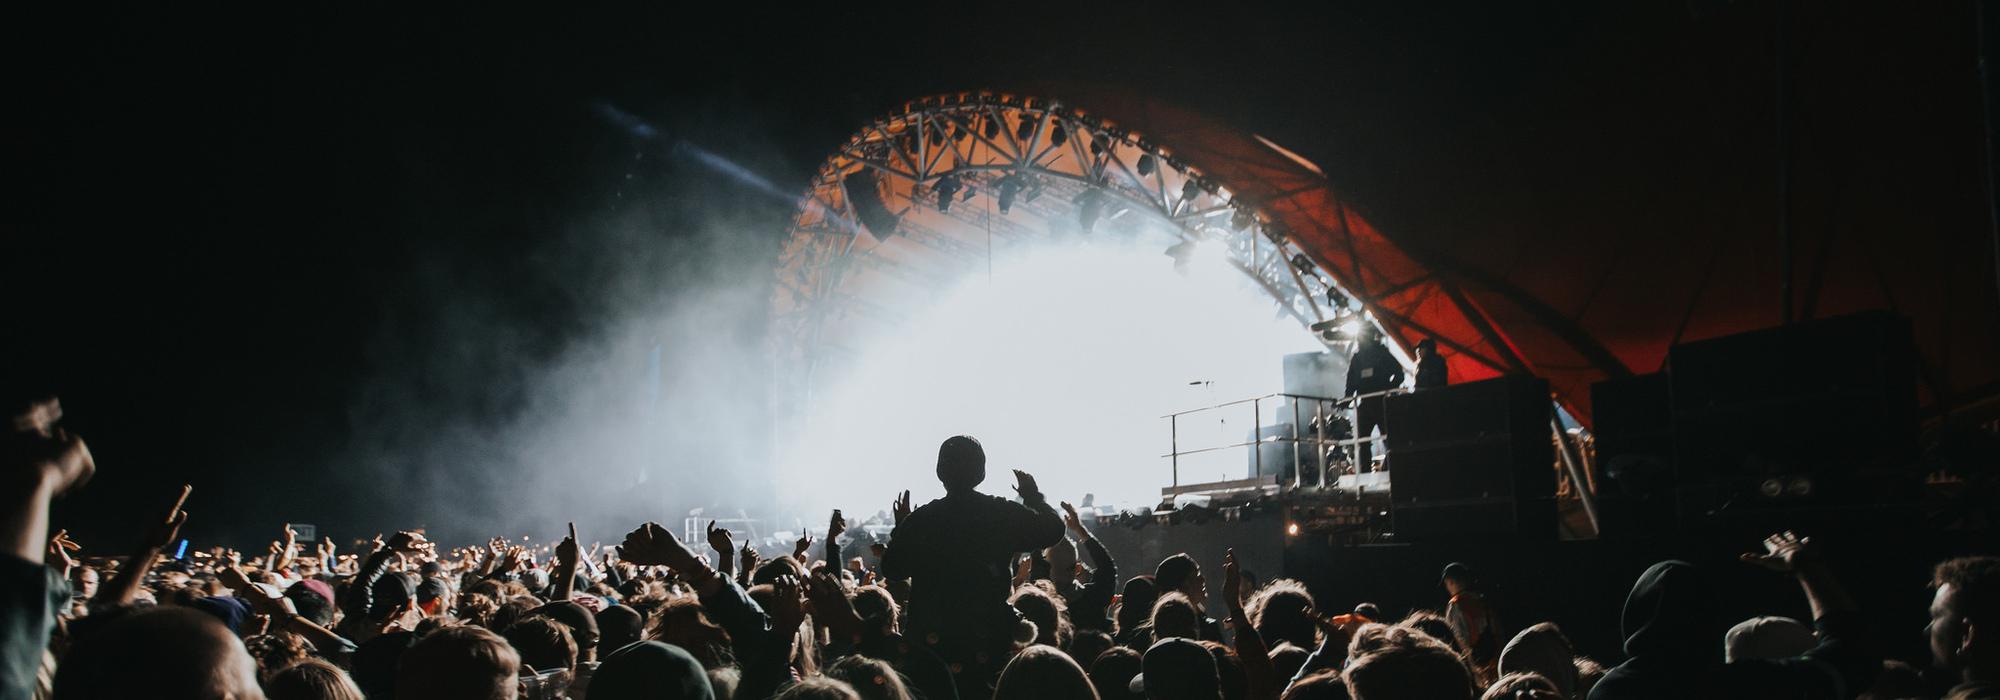 A Sad Summer Festival live event